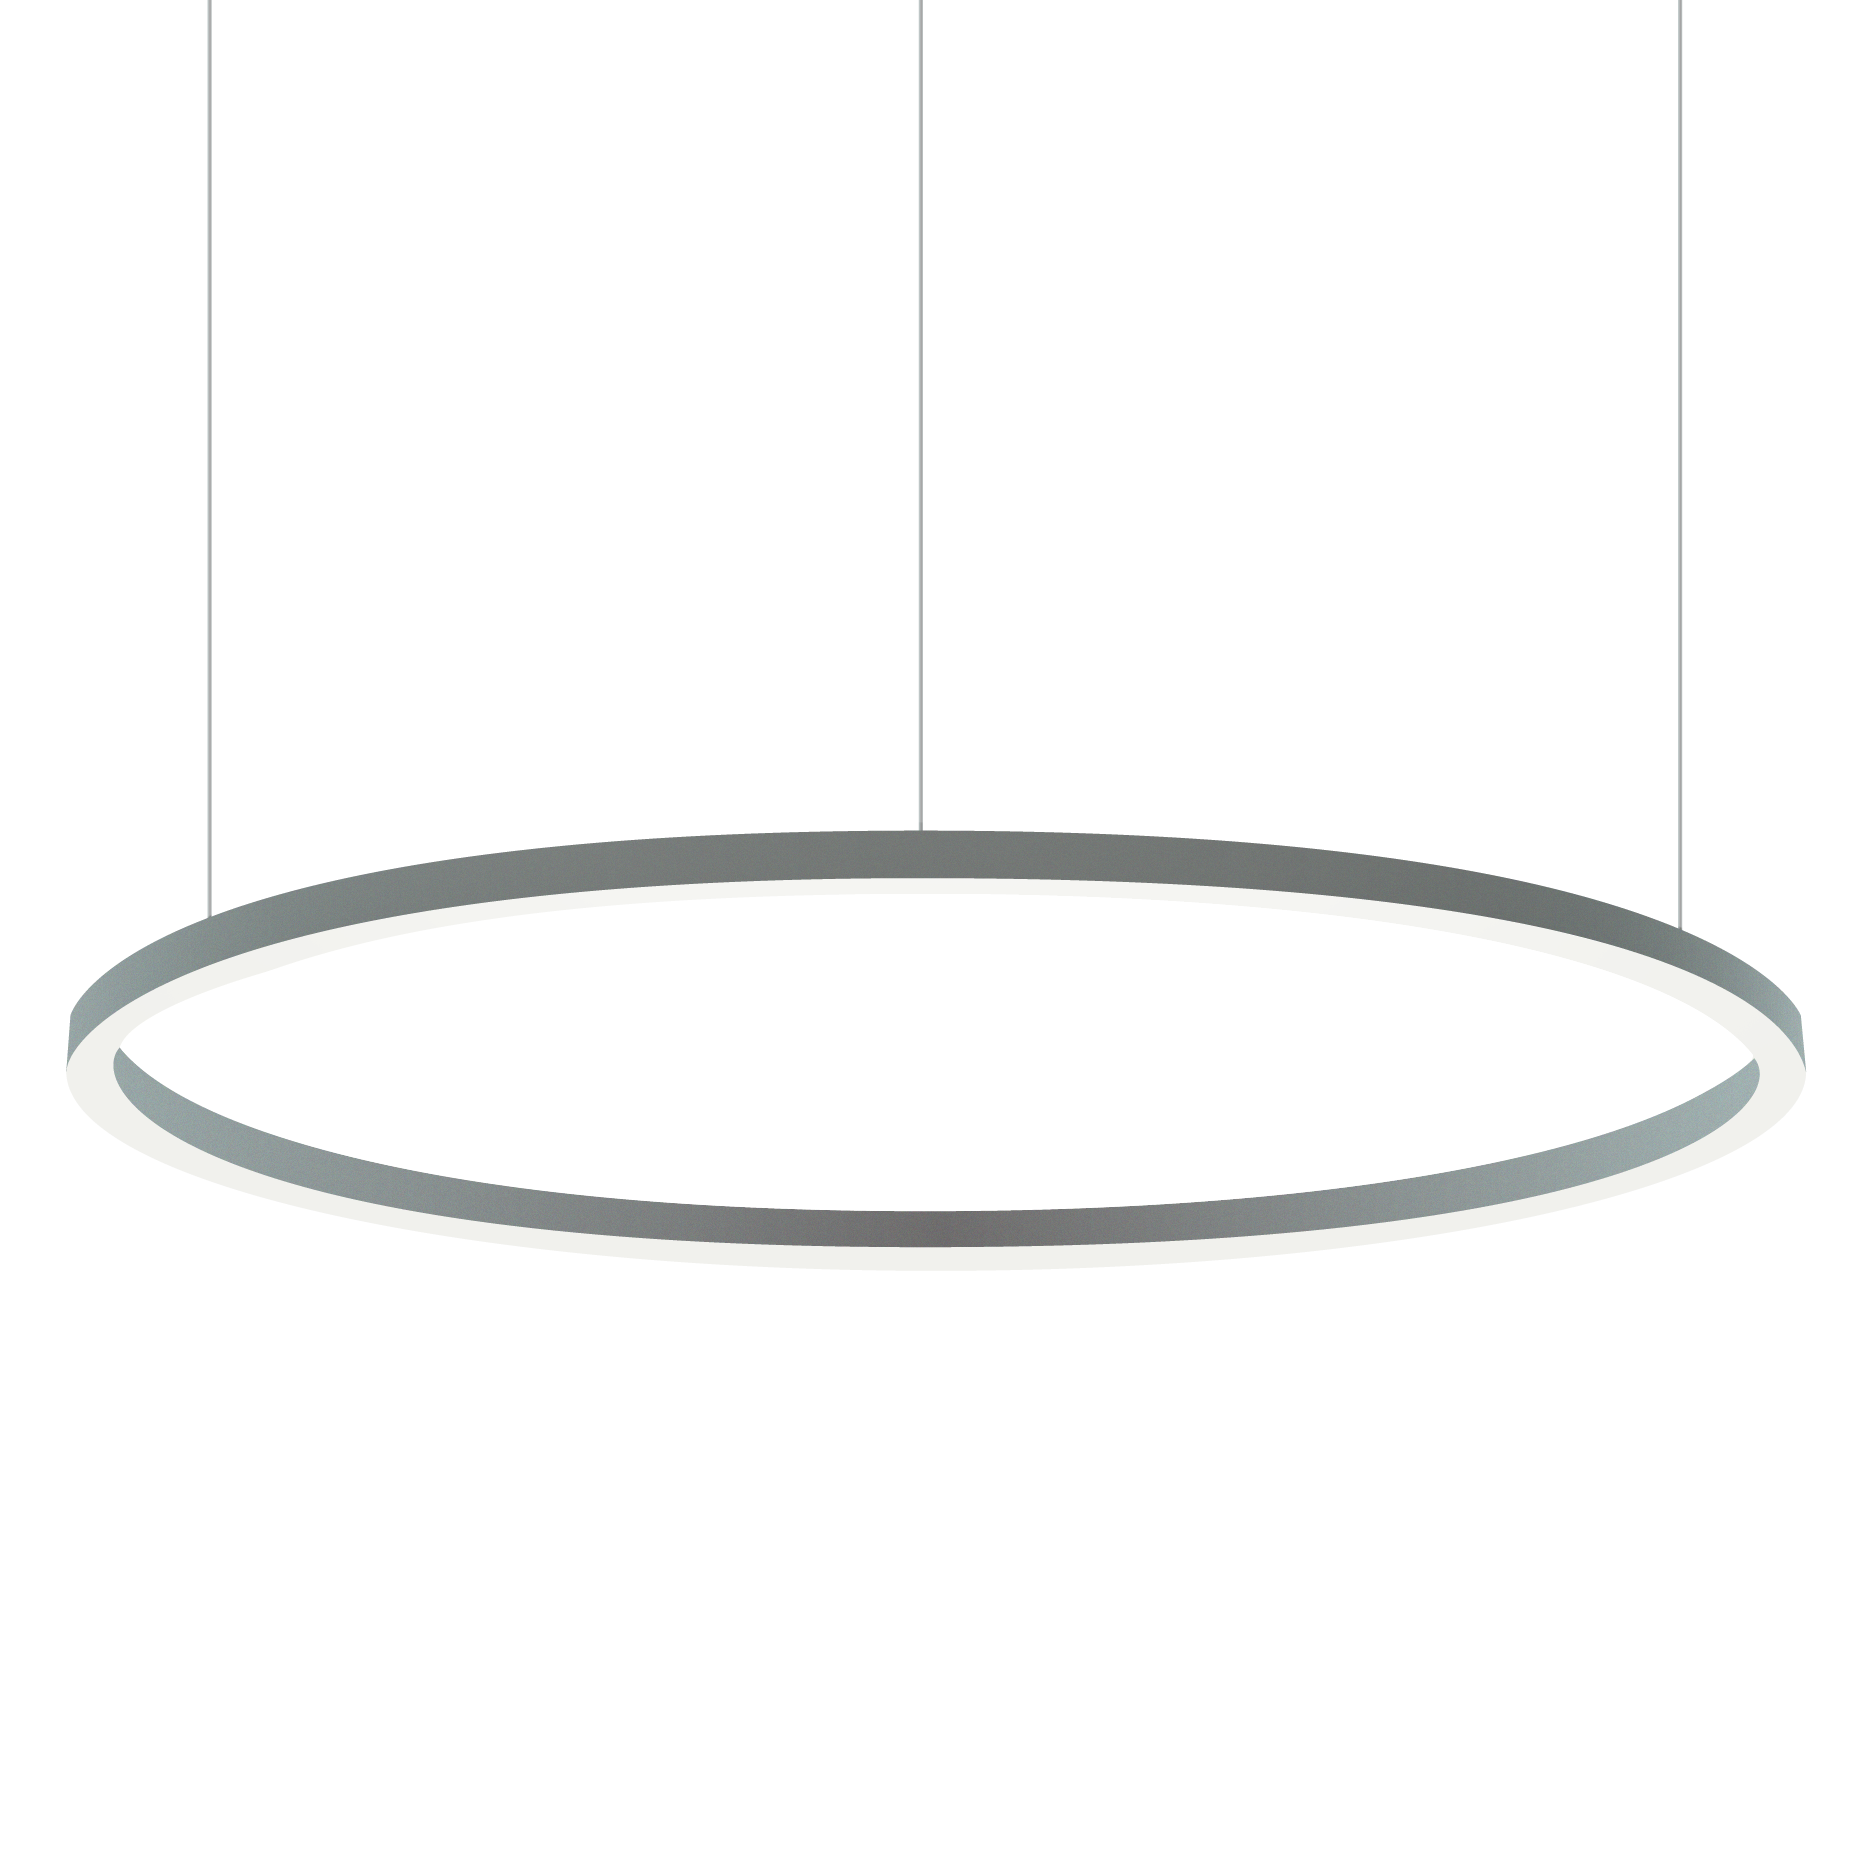 Alcon Lighting 12253 Circline Architectural Led Circular Pendant Mount Direct